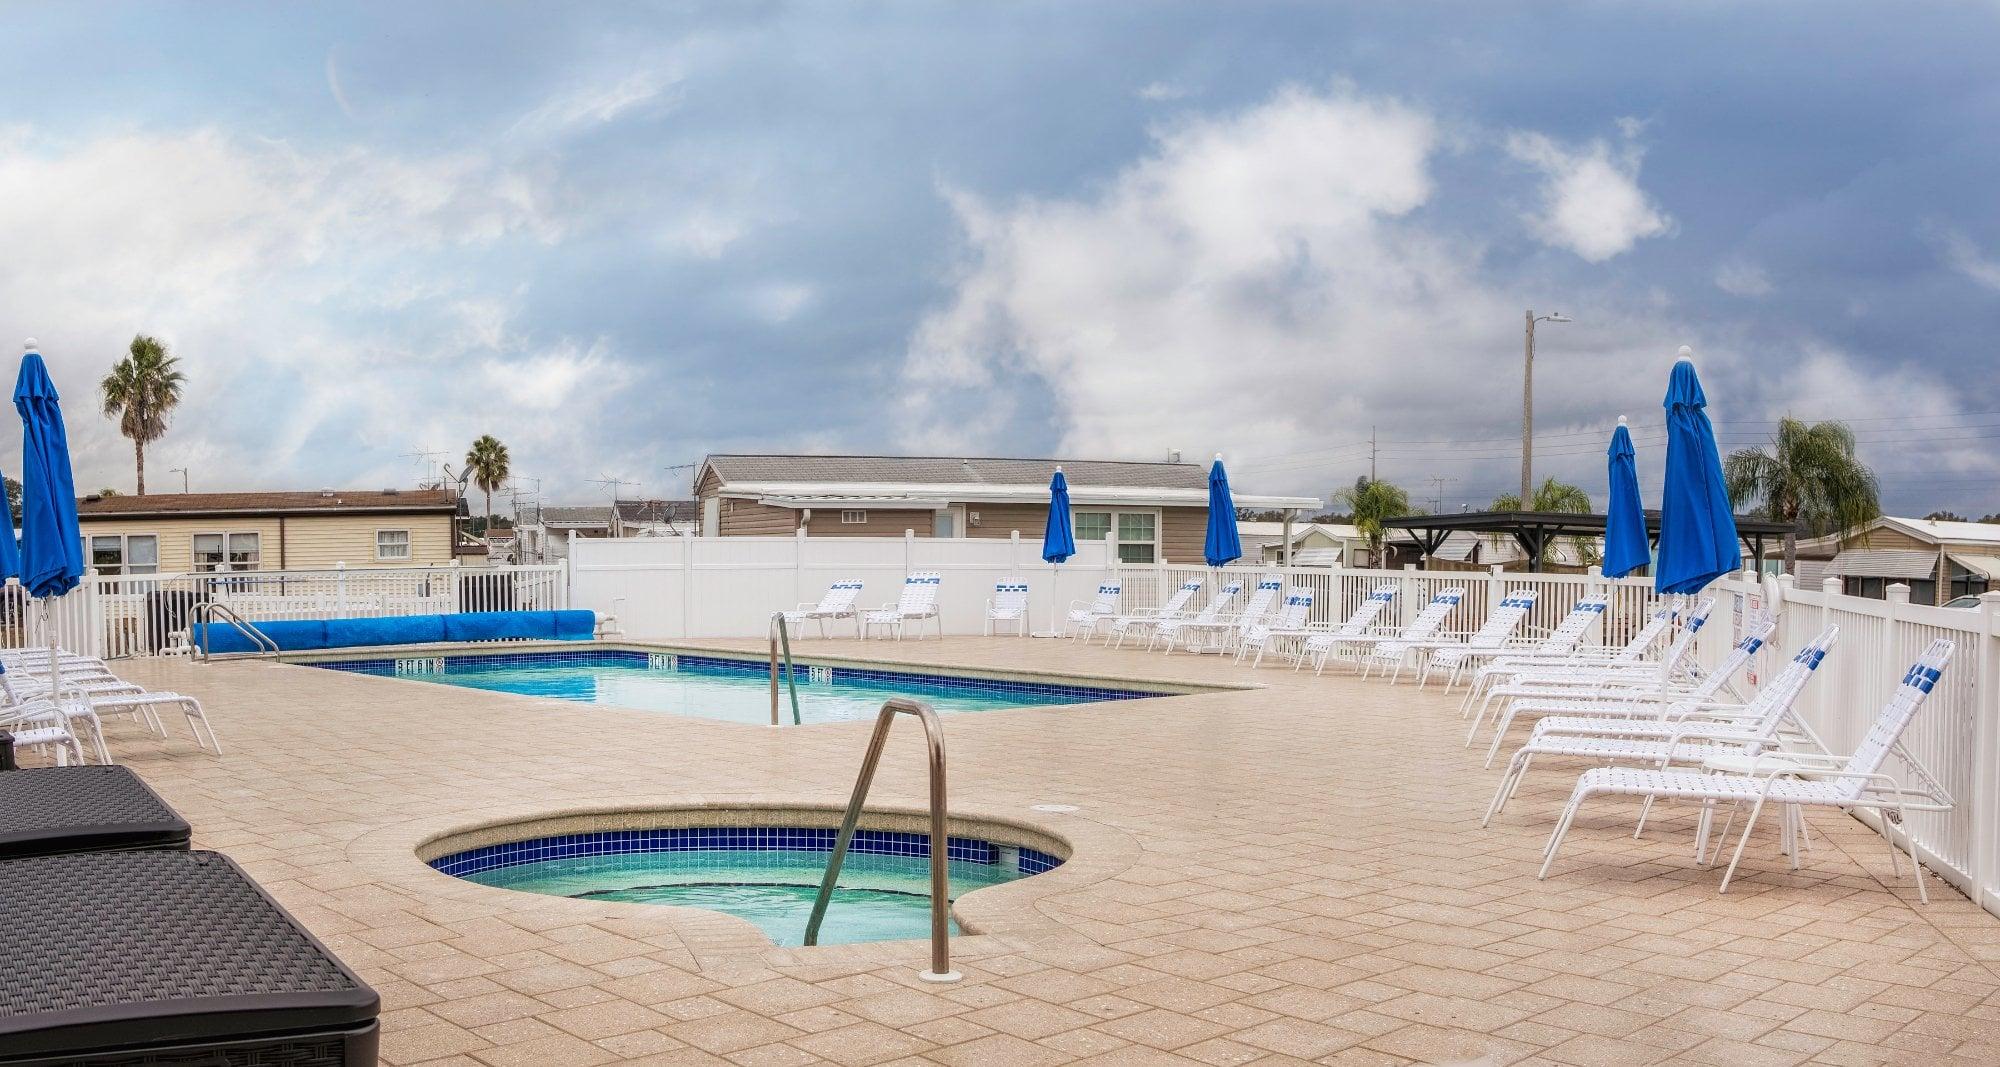 Hillcrest RV Resort